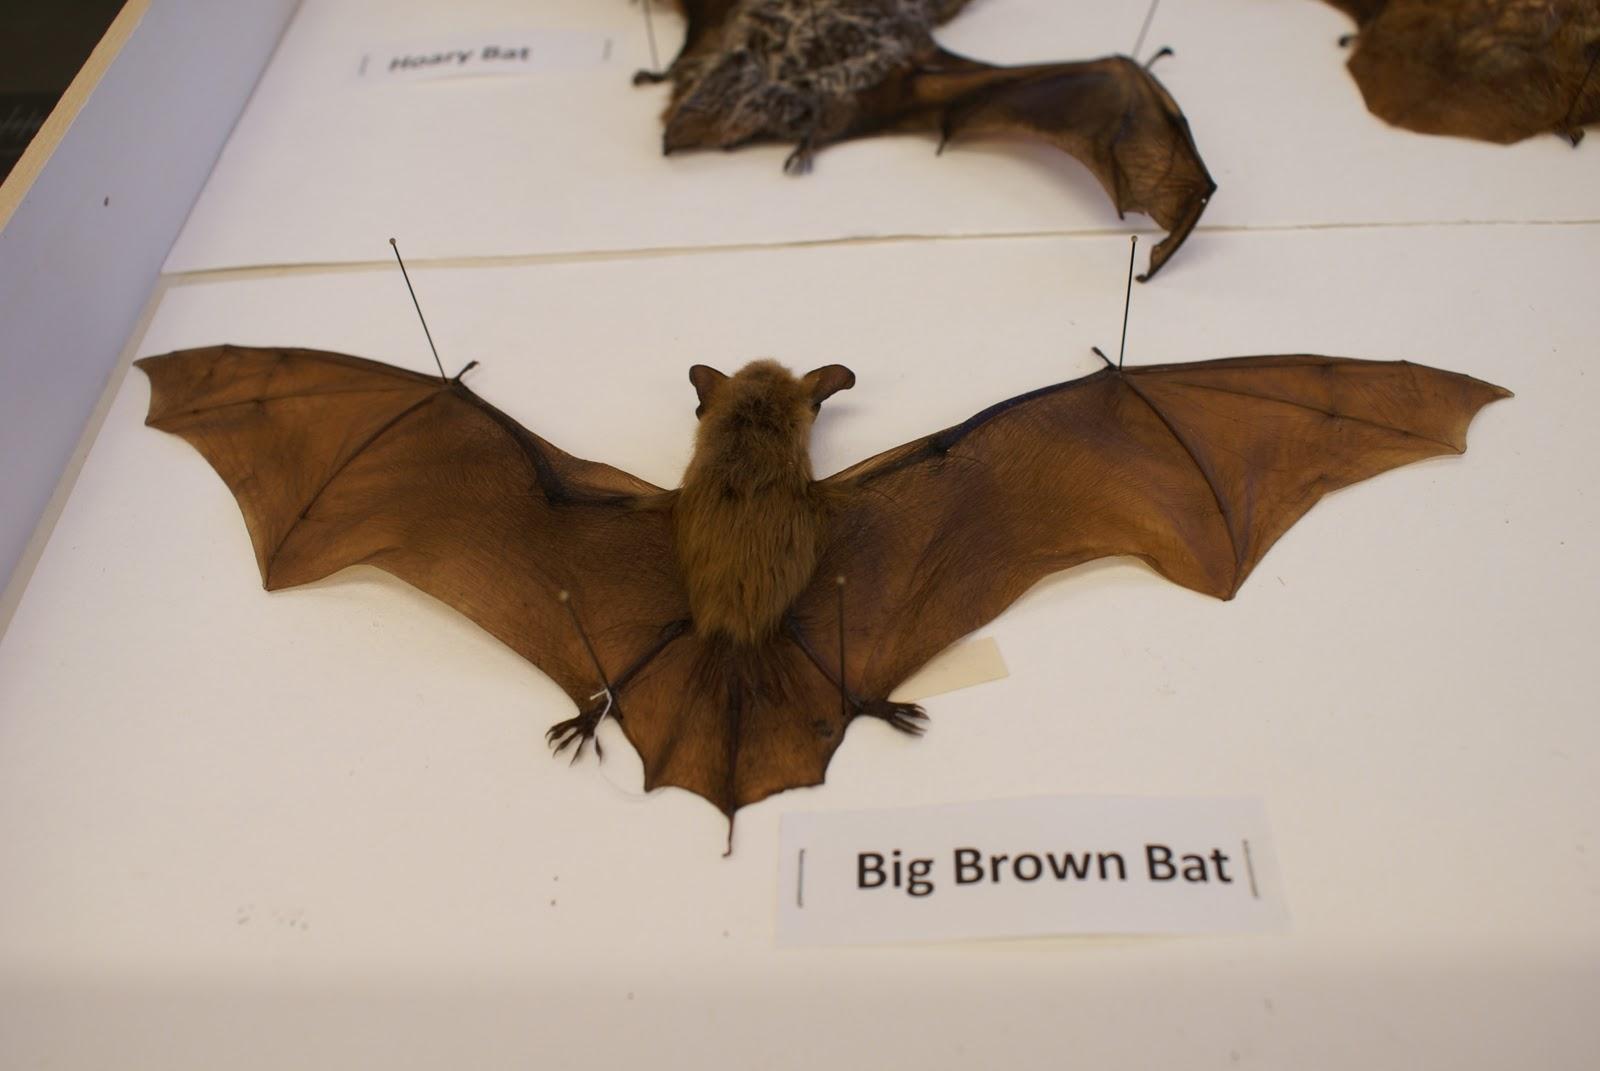 little brown bat diagram wiring diagram onlinenature gardens @ nhm l a \u0027s urban nature happy halloween bats! label parts of a bat little brown bat diagram